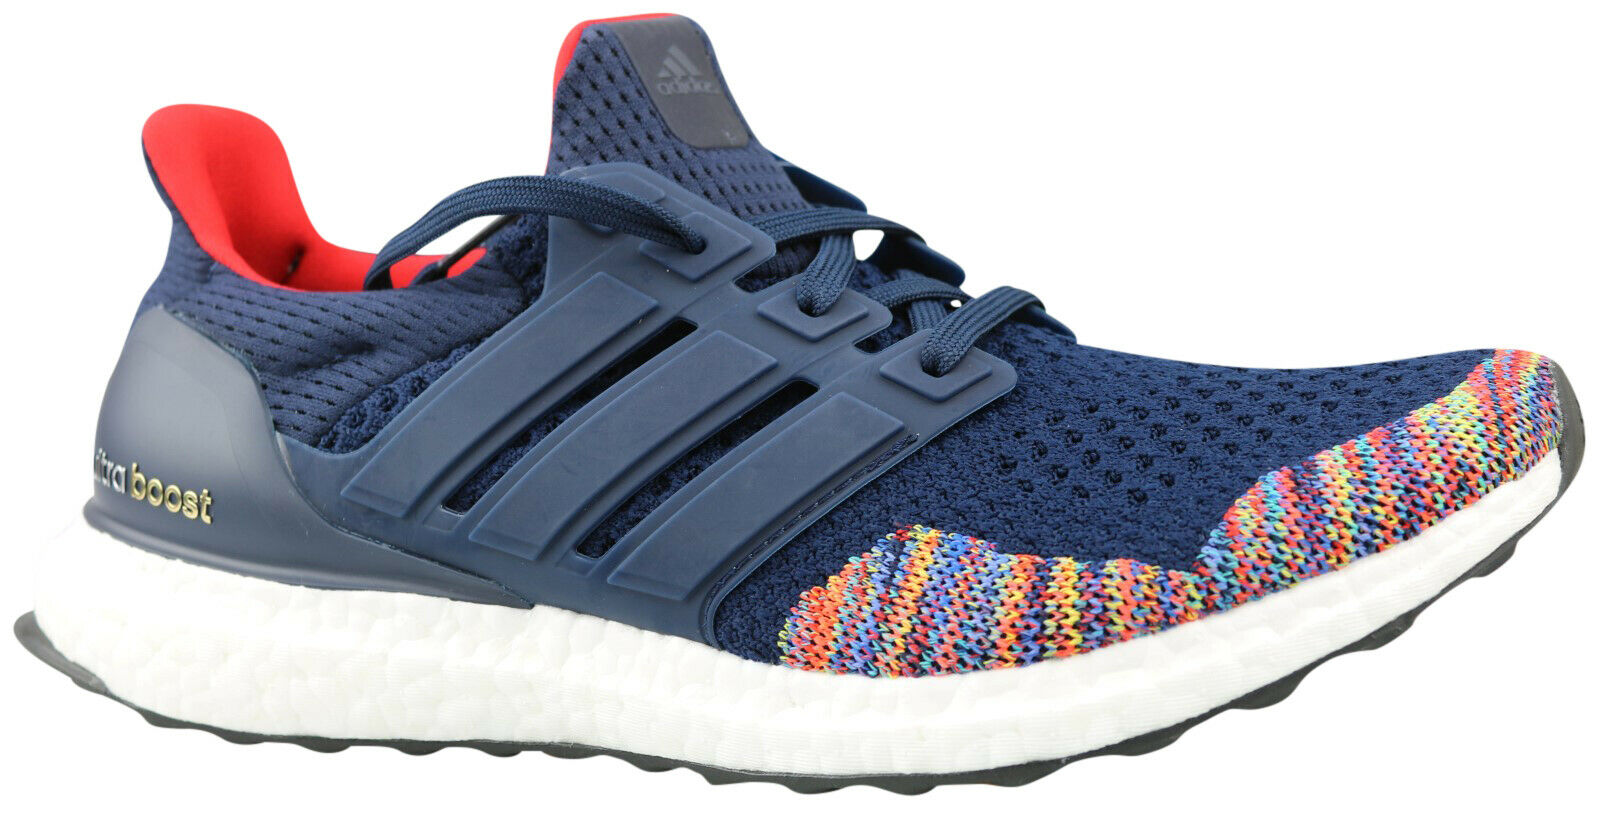 Adidas Ultra Boost LTD Zapatos de Running para Hombre zapatilla de deporte Azul BB7801 Tamaño 40 - 45 NUEVO